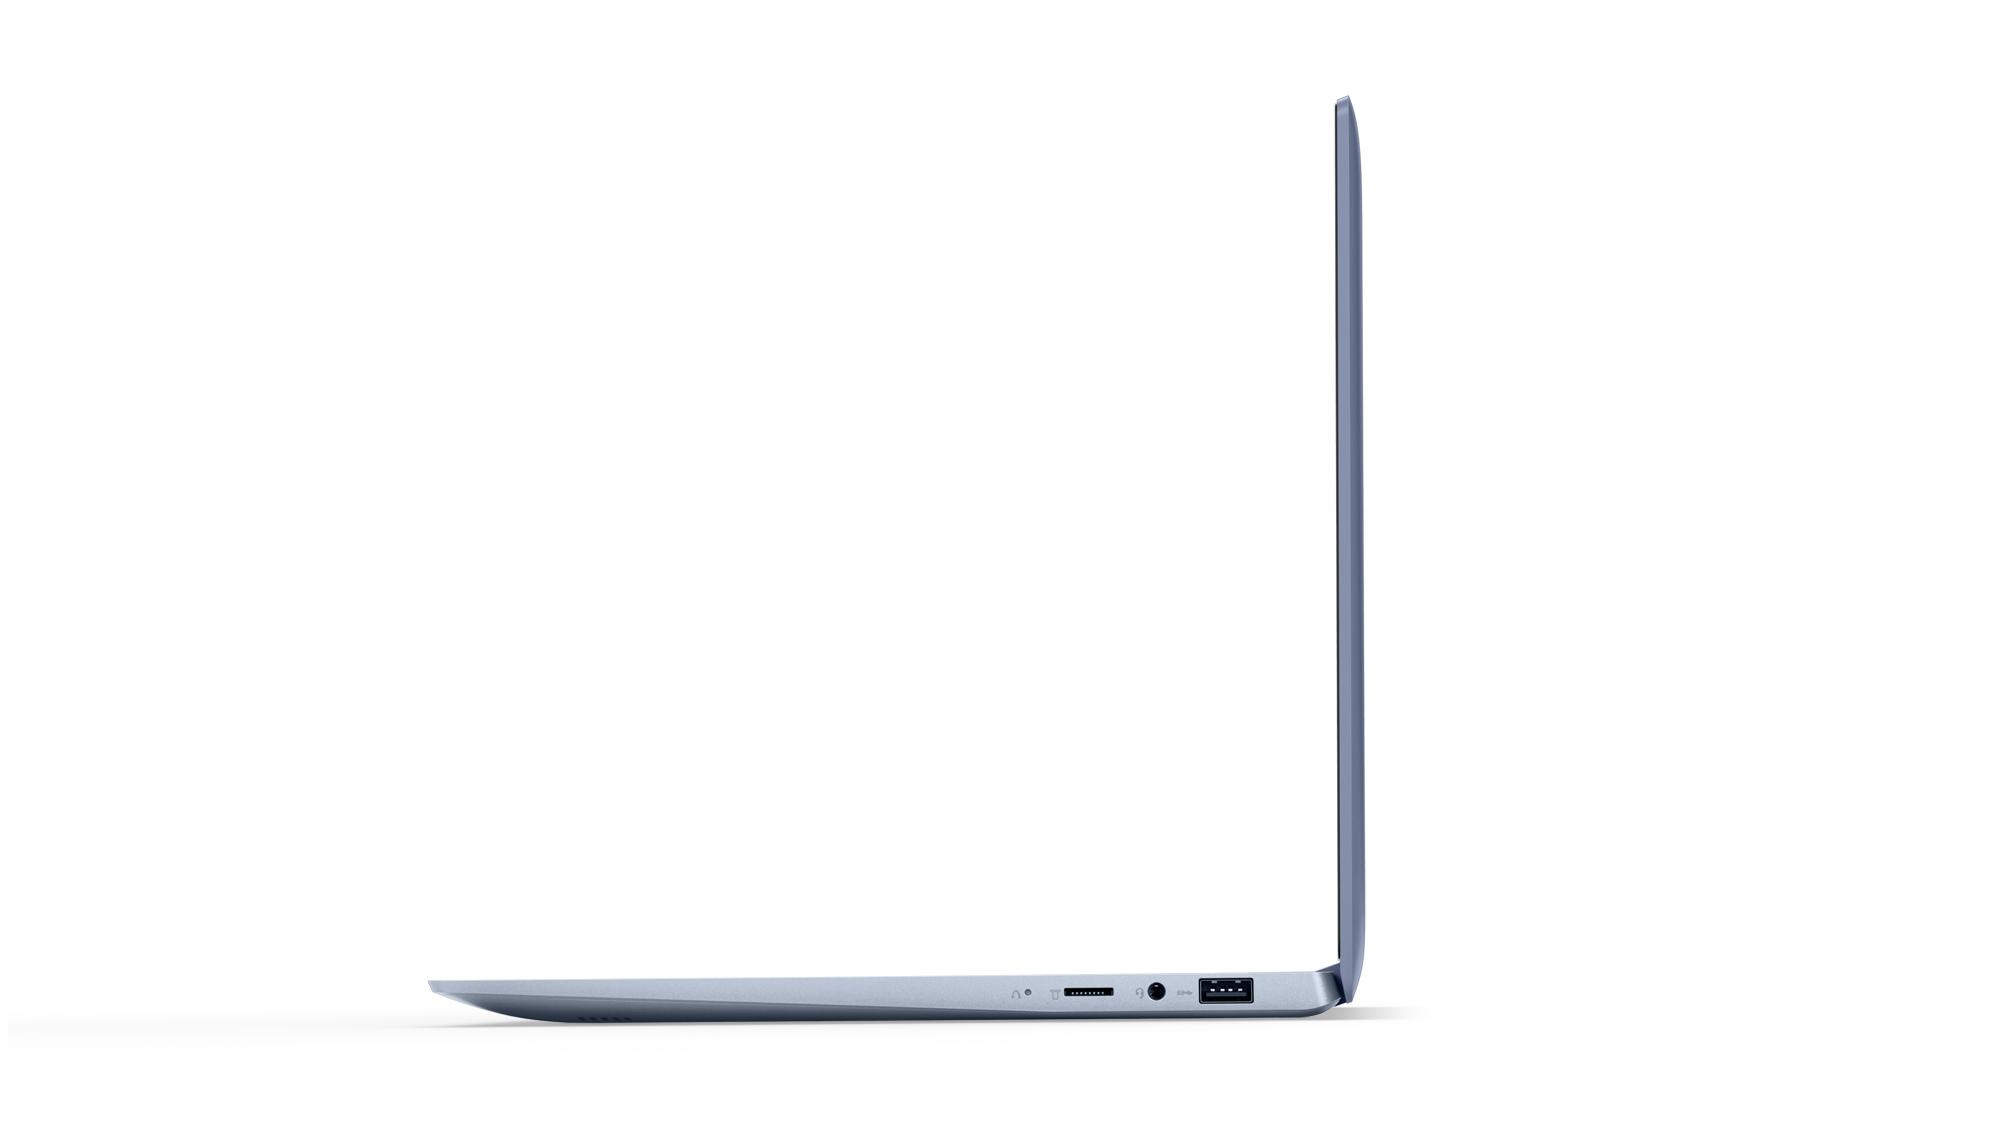 Фото  Ультрабук Lenovo ideapad 120S-14 Denim Blue (81A500BQRA)